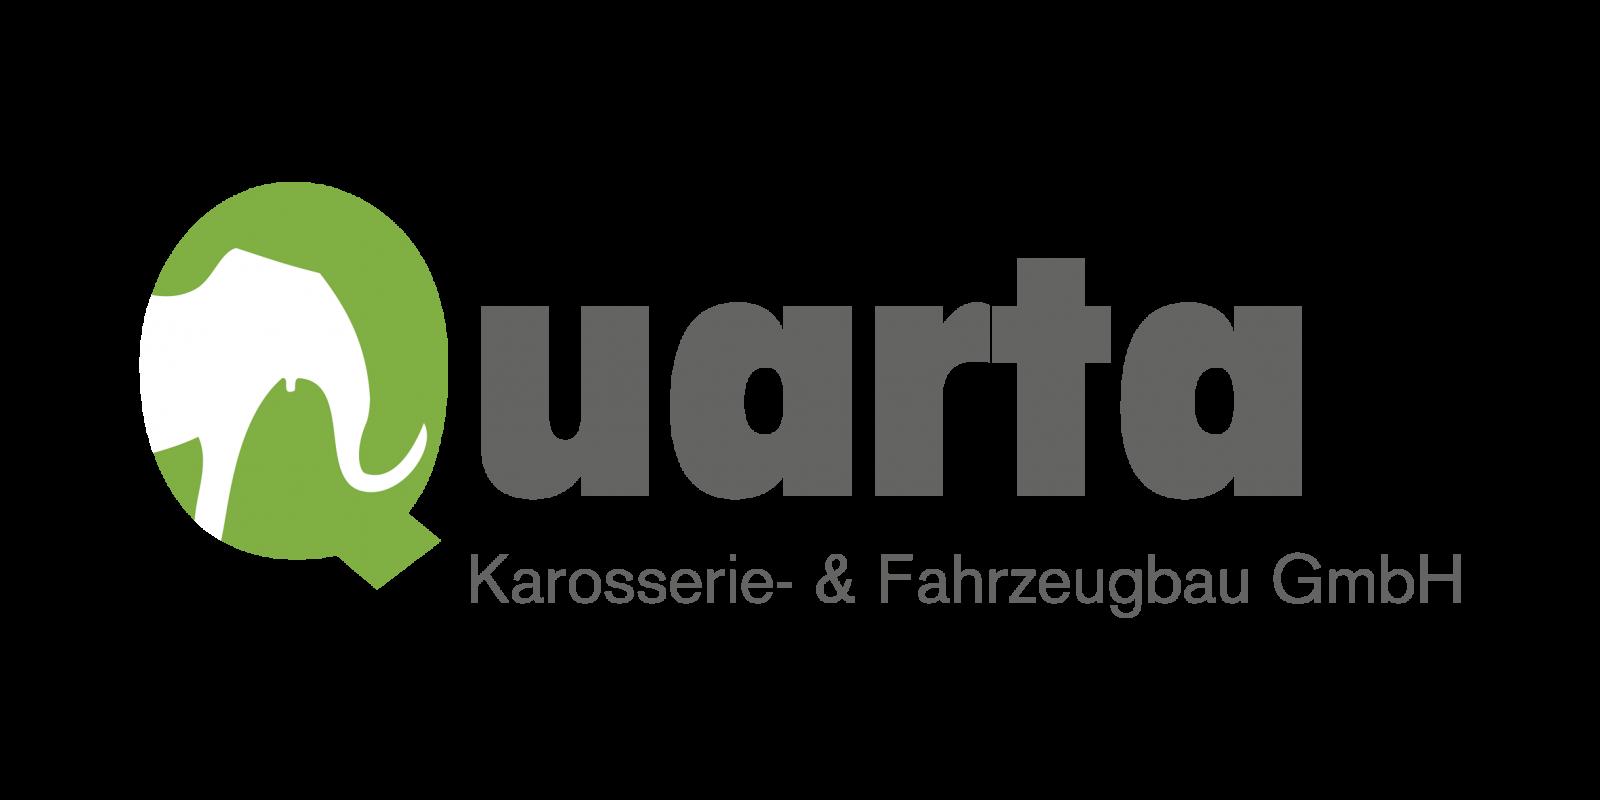 Quarta Karosserie- und Fahrzeugbau GmbH